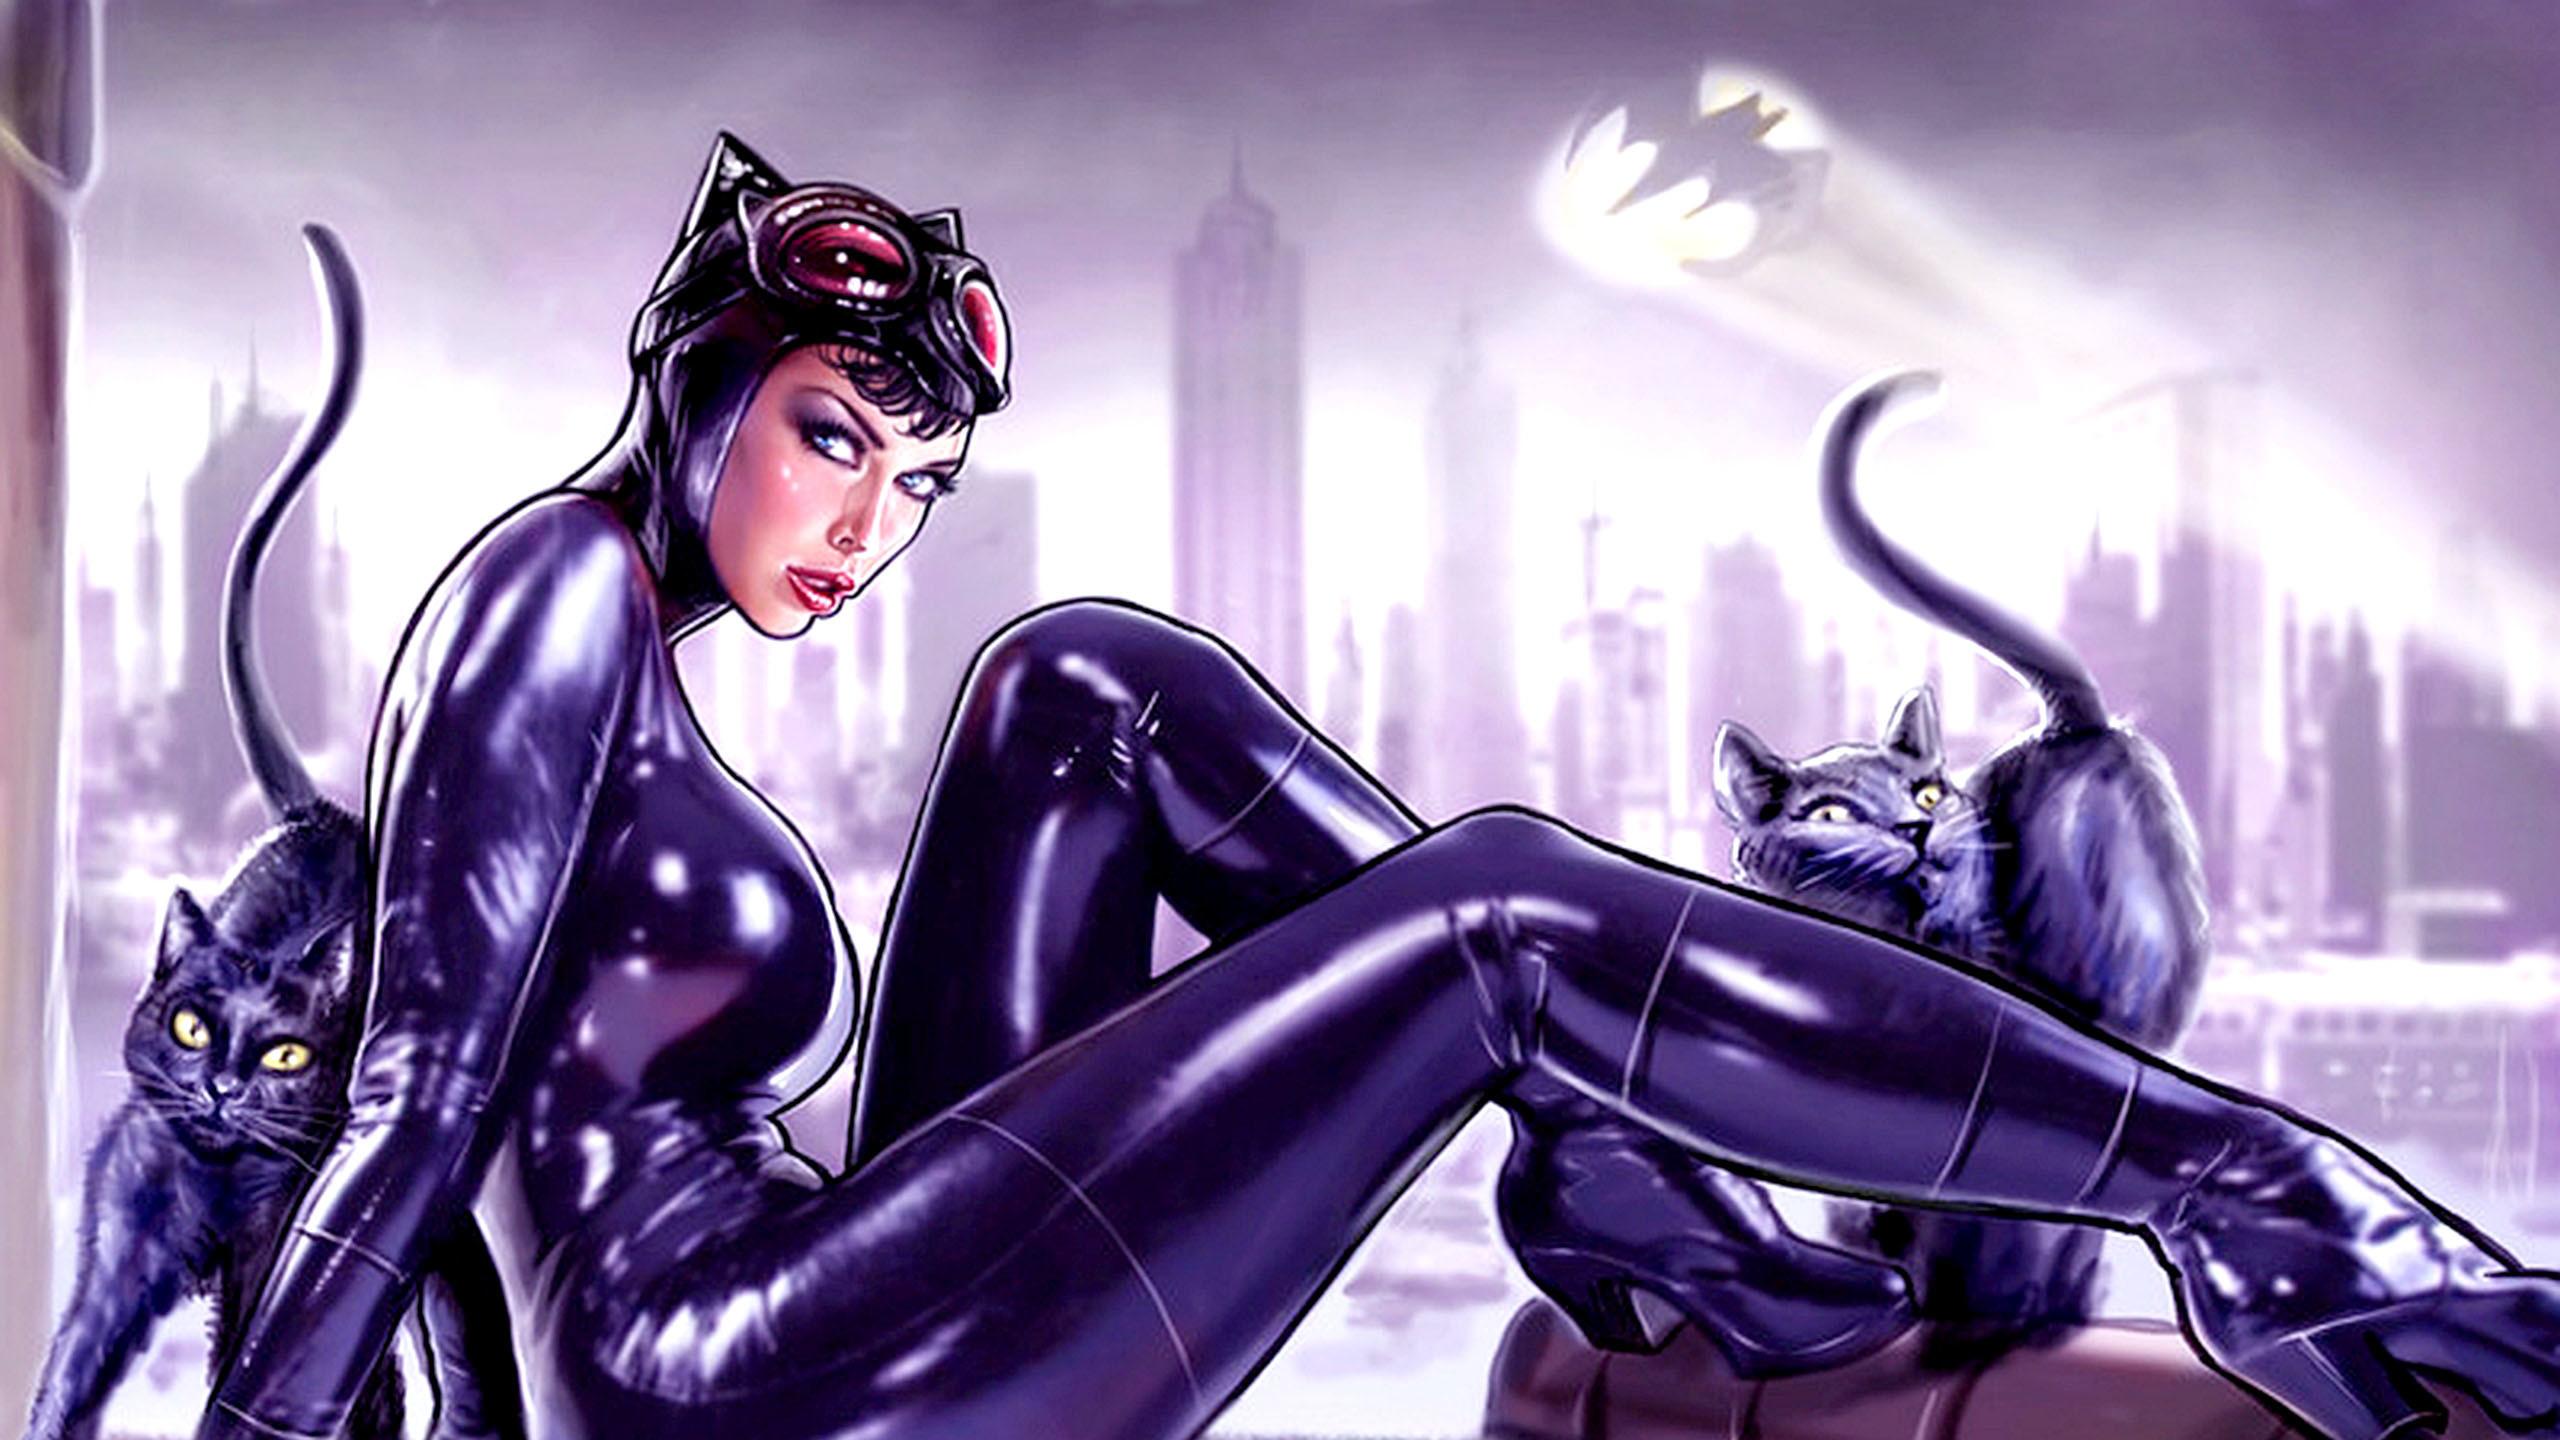 catwoman new 52 – 1080 HD Wallpaper